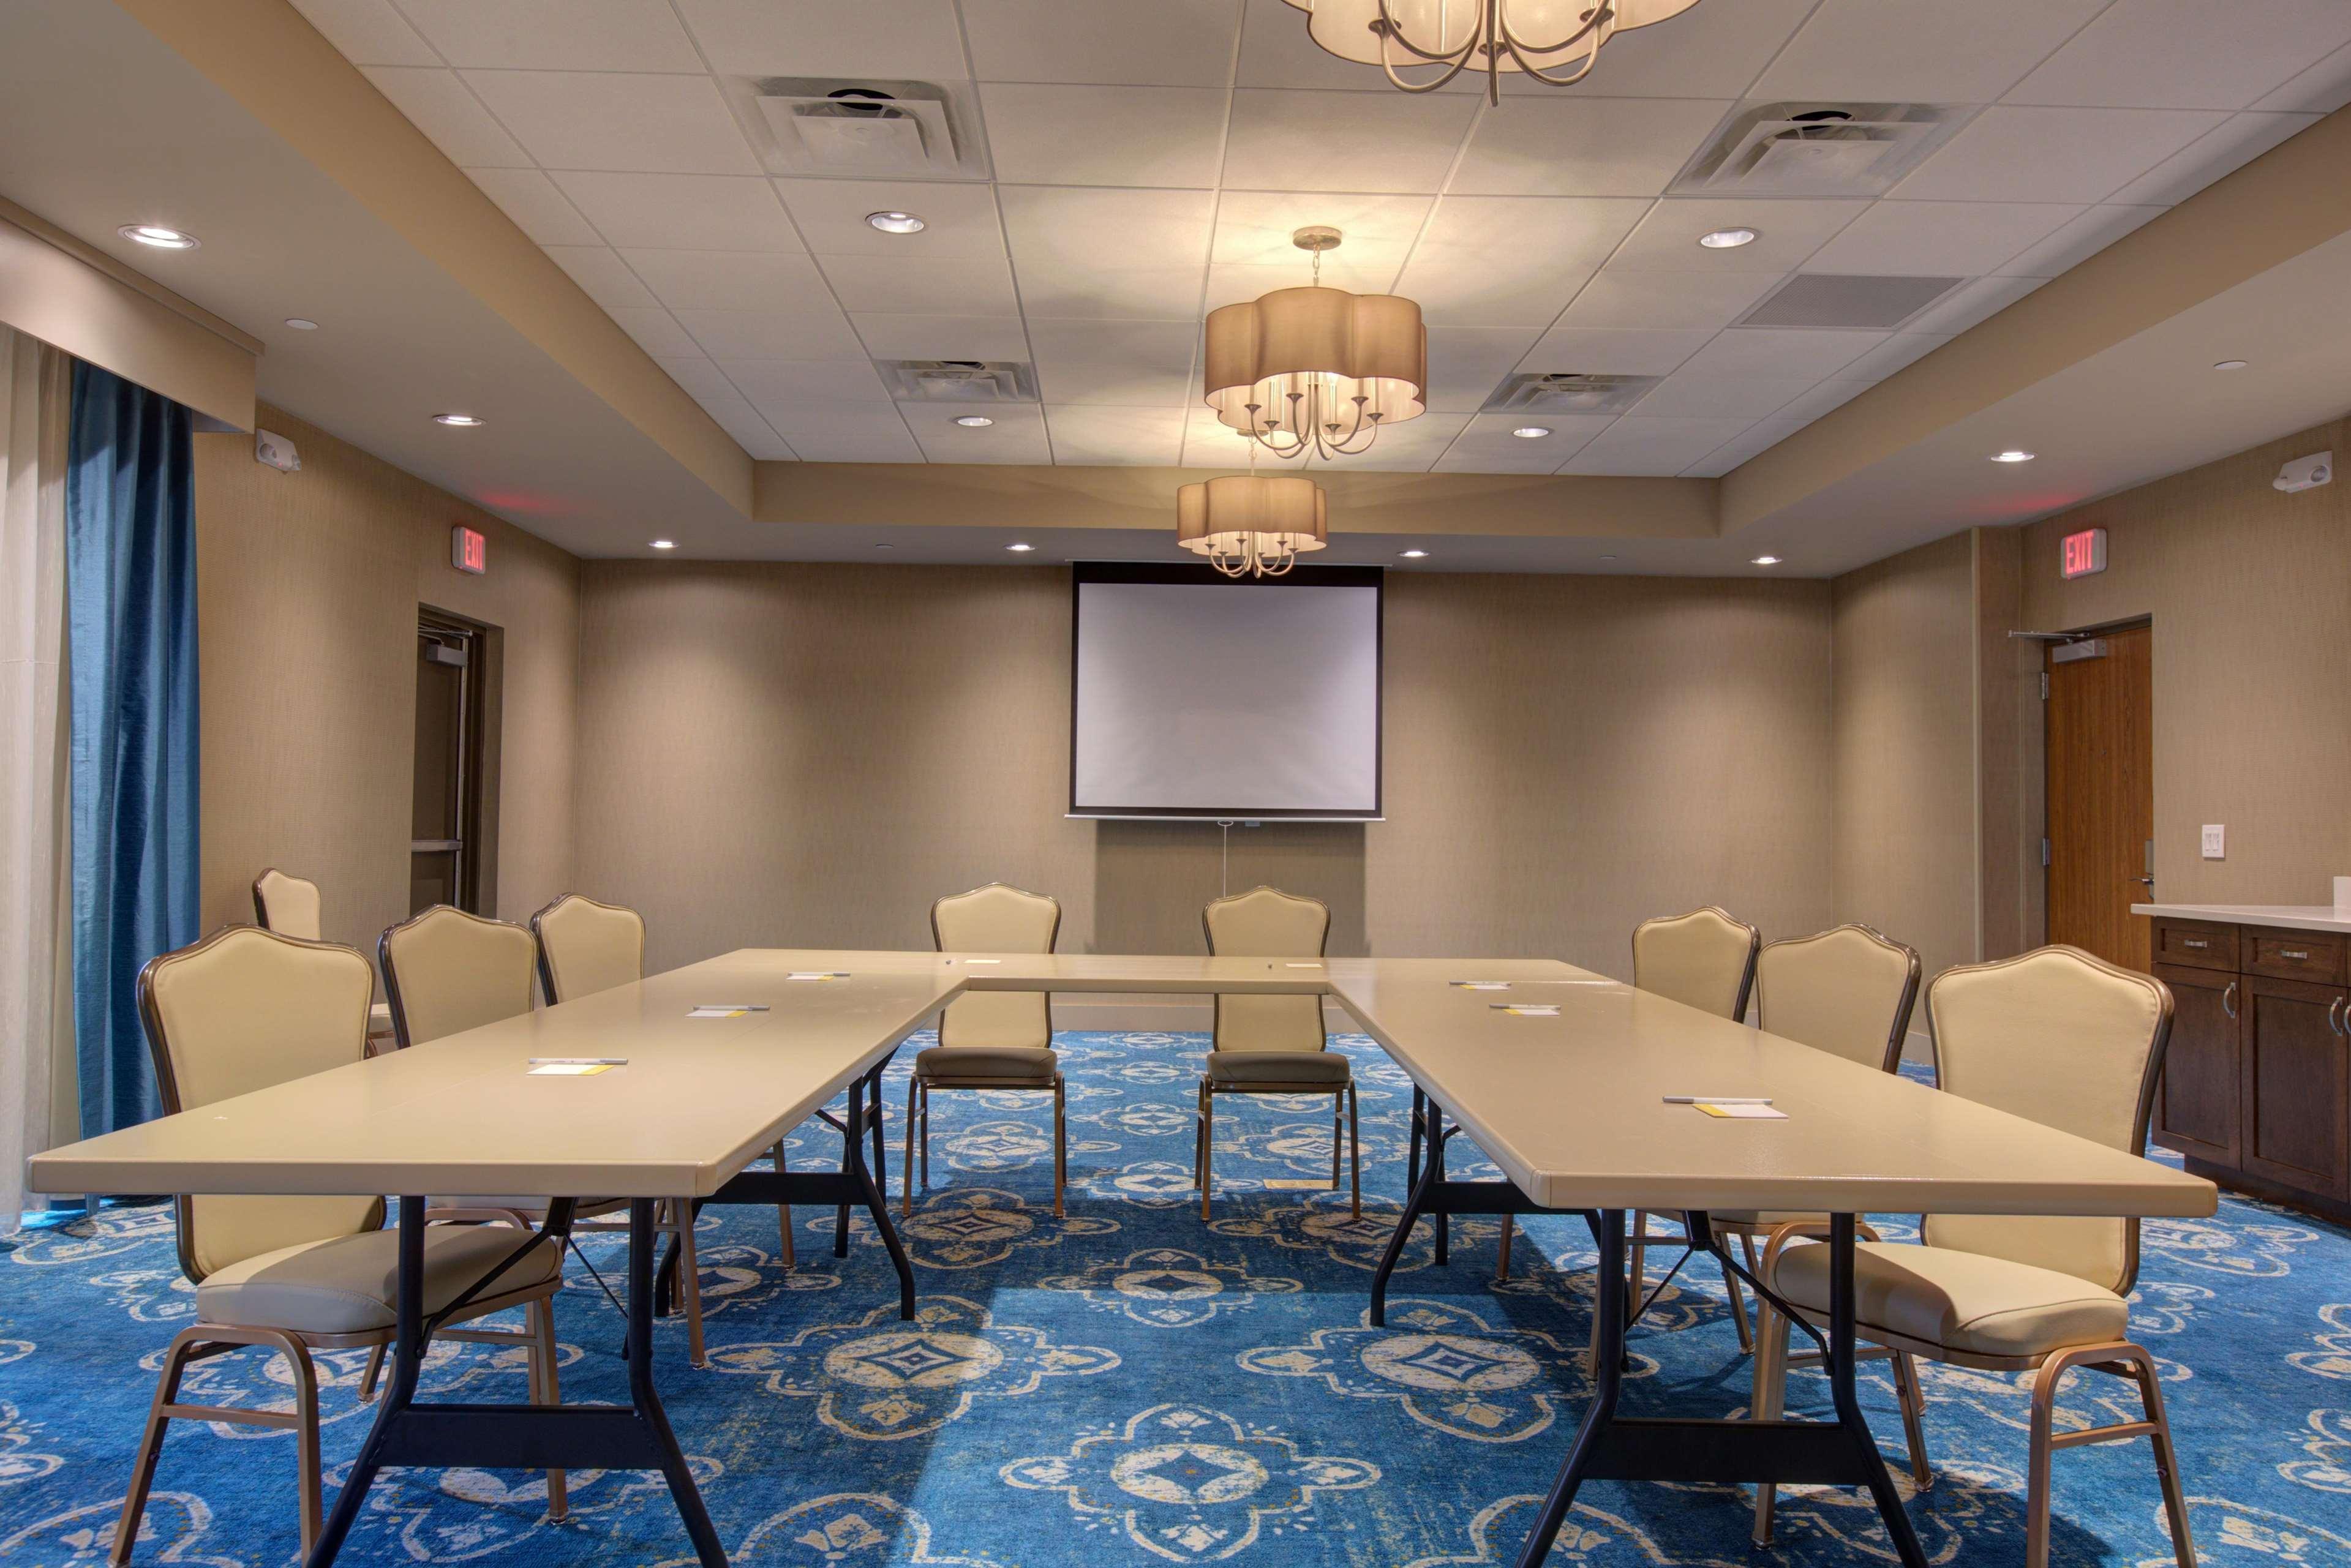 Hampton Inn Suites Tampa Busch Gardens Area In Tampa Fl 33612